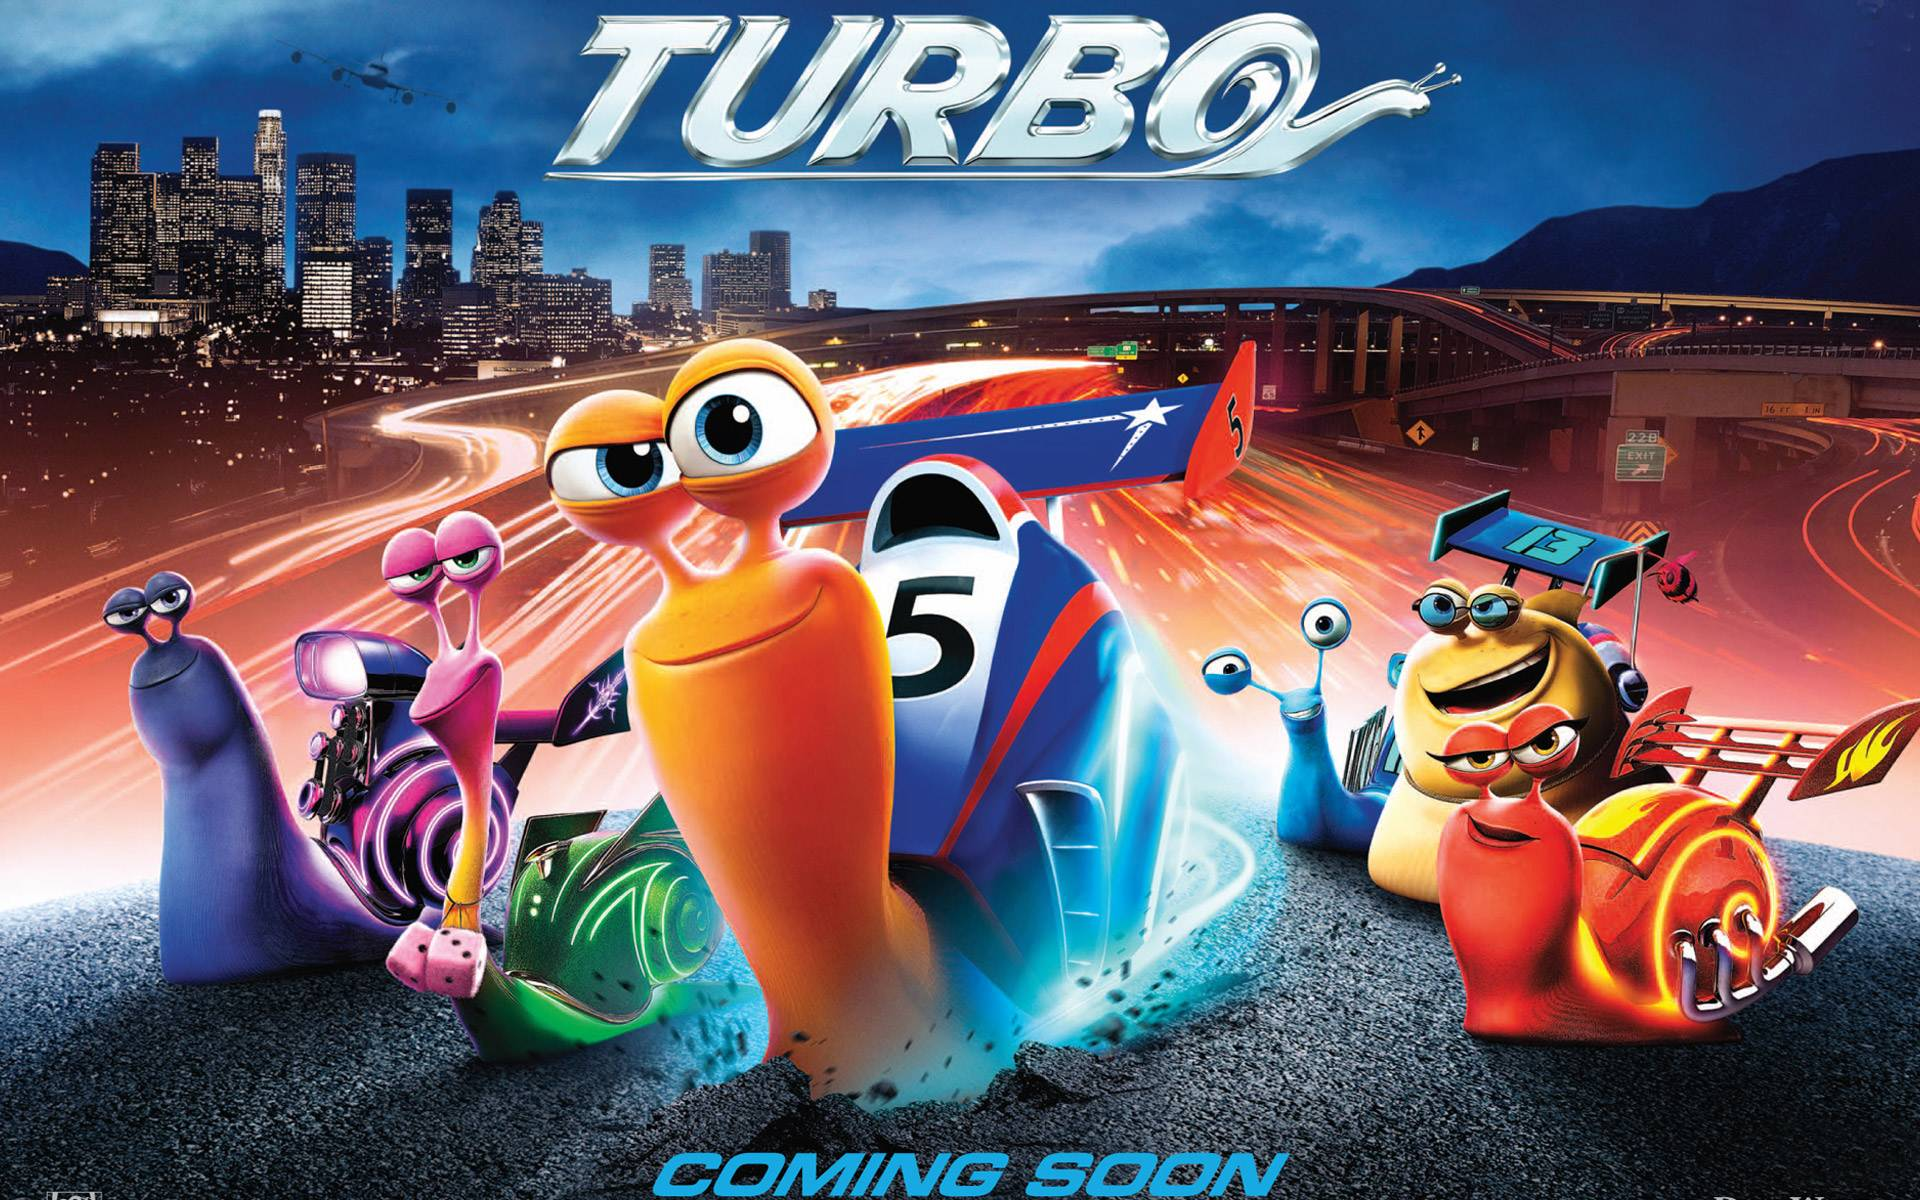 Turbo Film